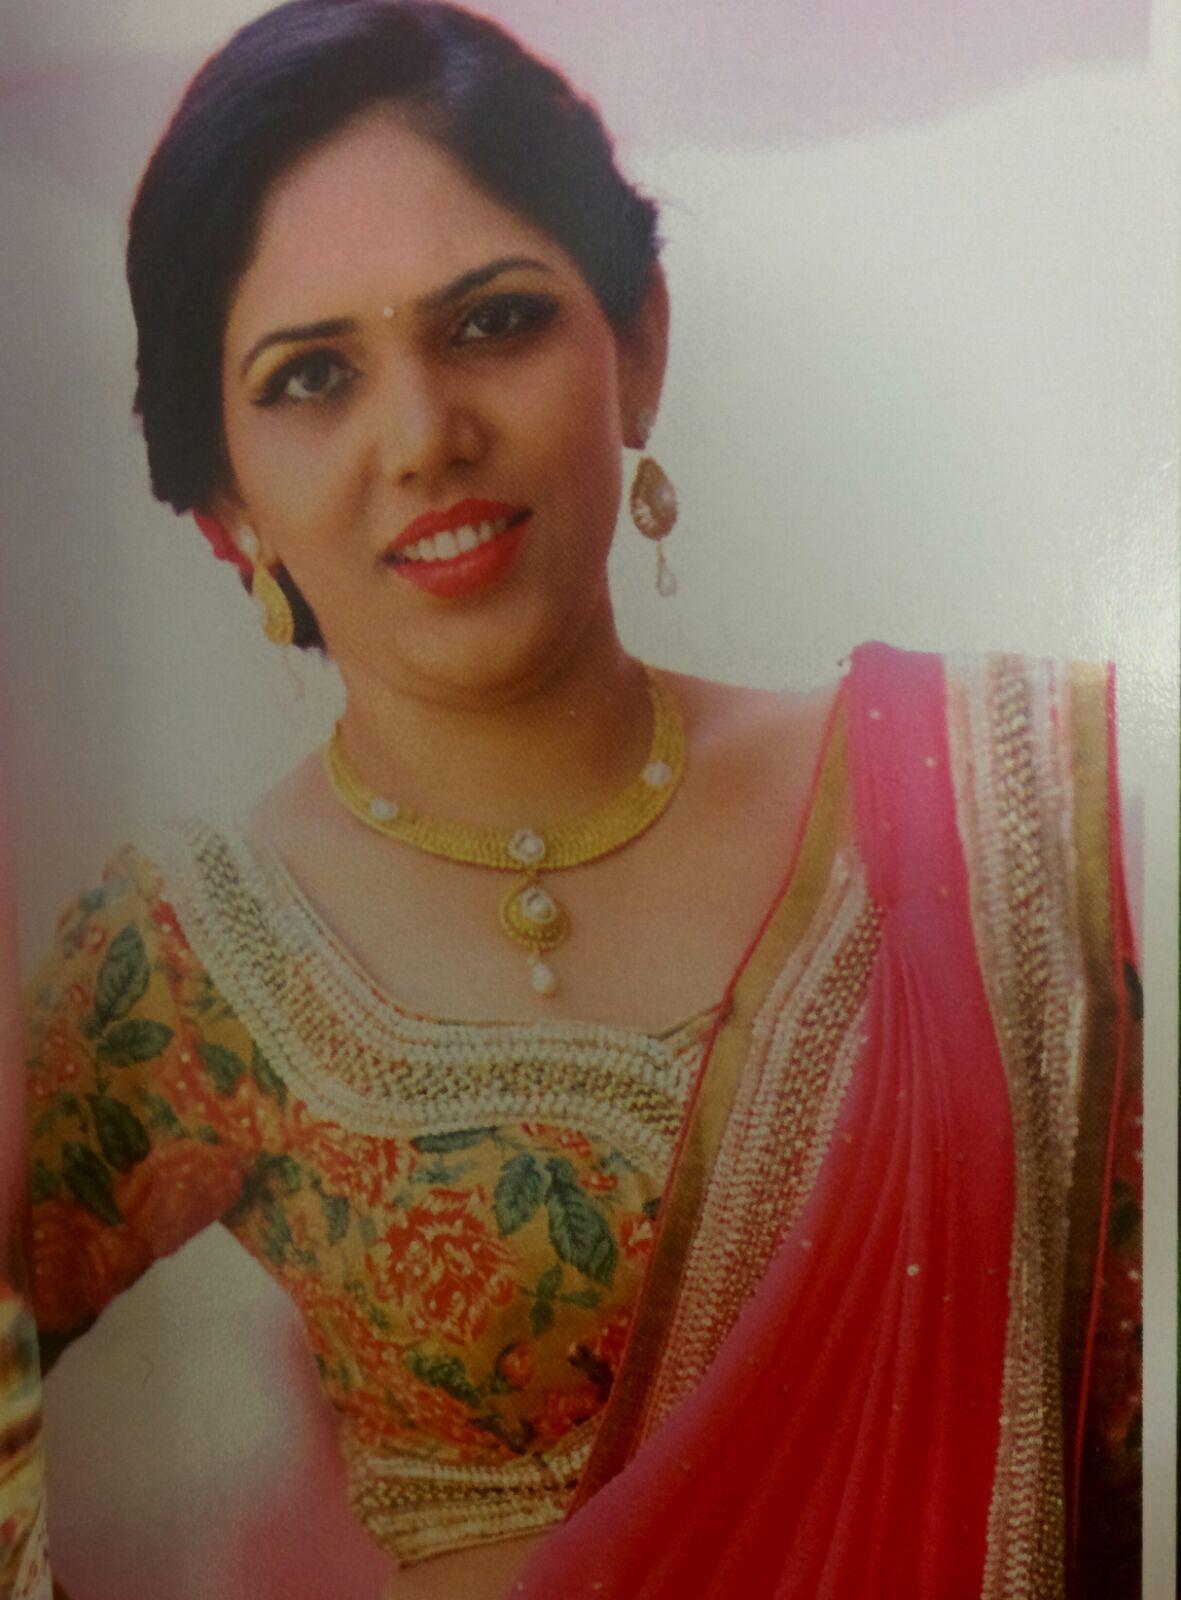 Nikita Patel                                                                                                    Nikita Patel